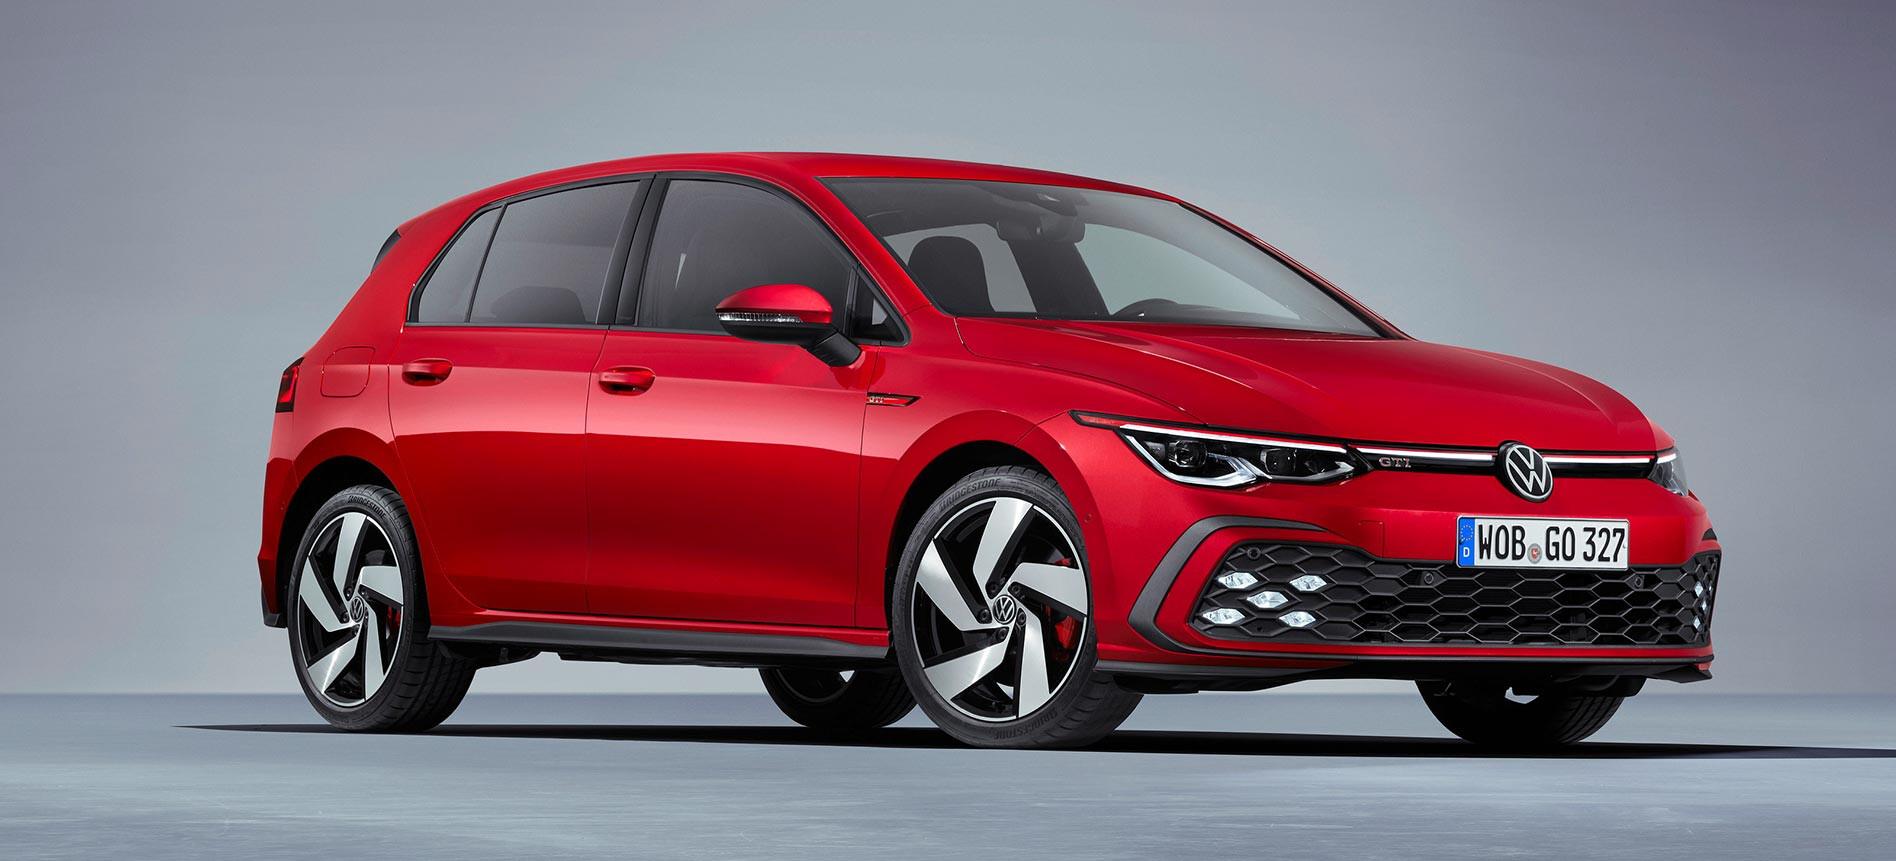 Volkswagen Mk8 Golf GTI revealed news